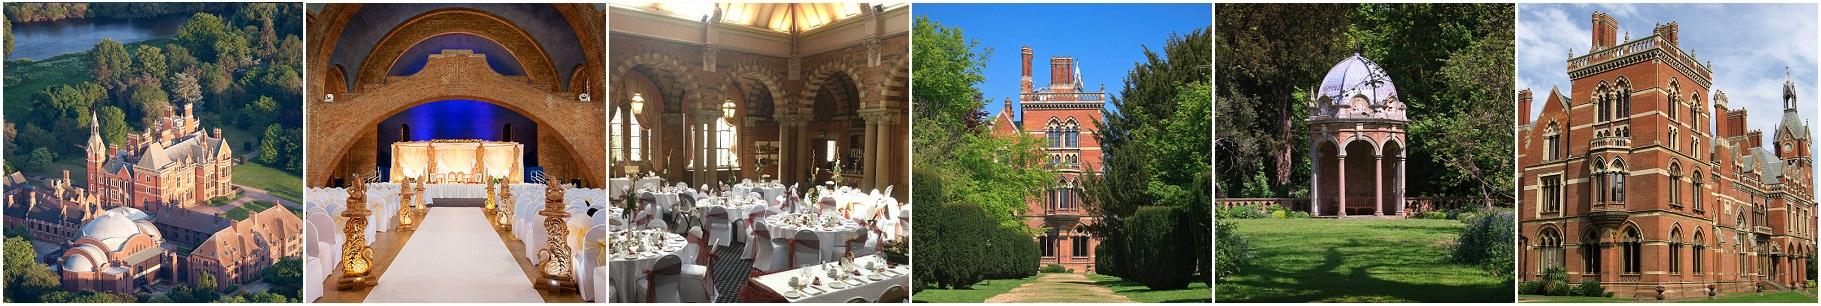 Kelham Hall Photos - Nottinghamshire Wedding Venues